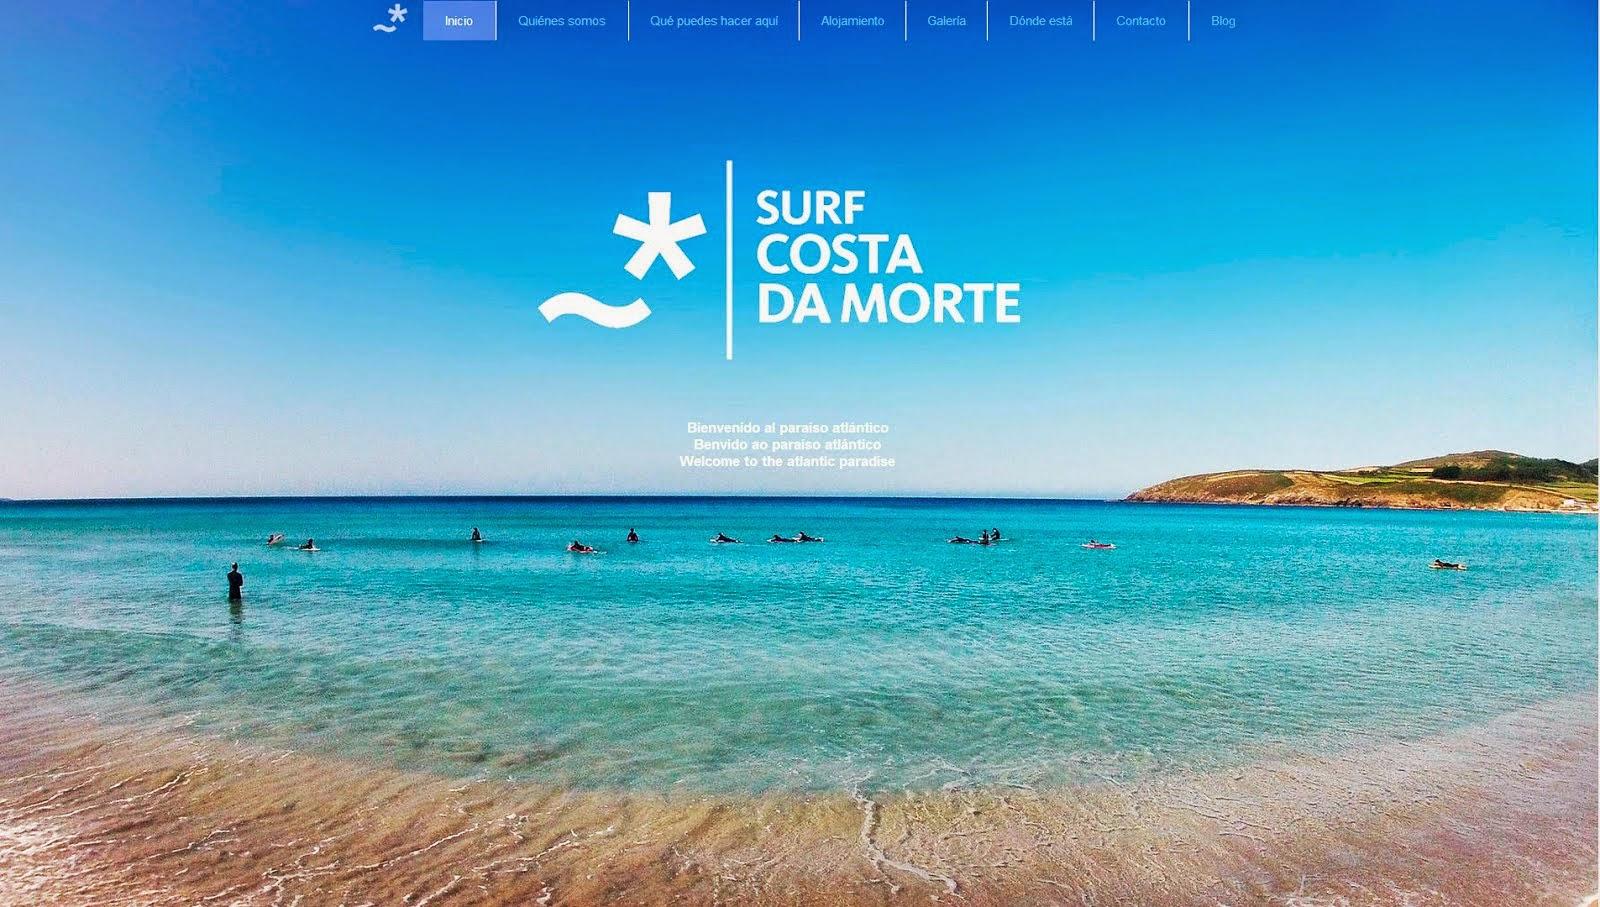 WWW.SURFCOSTADAMORTE.COM